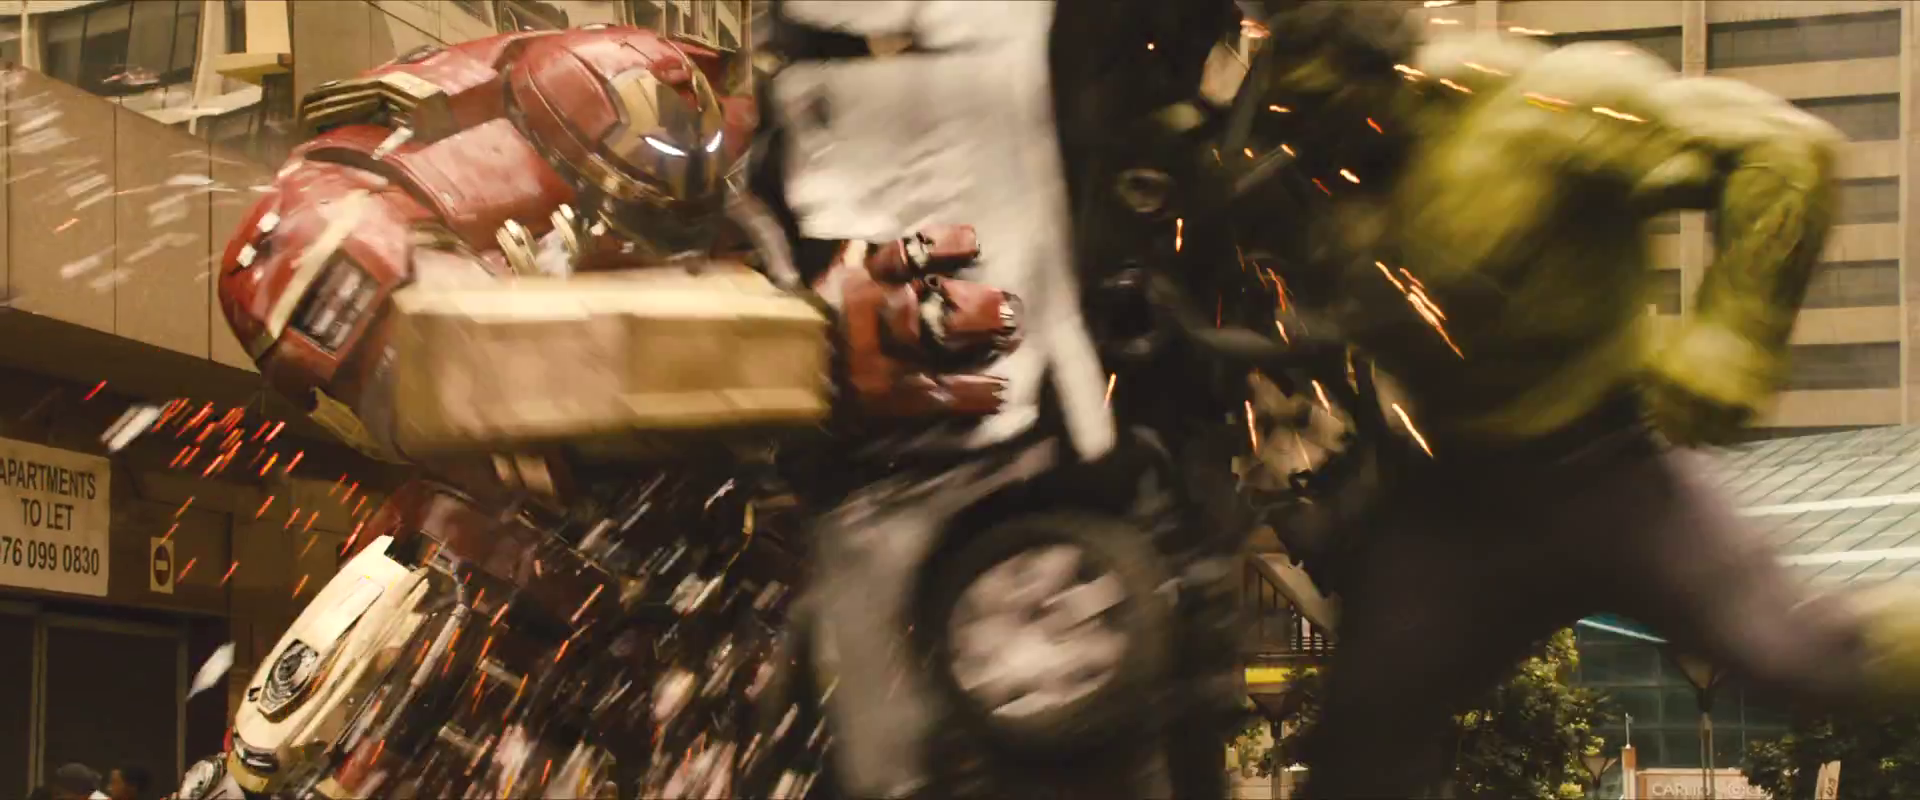 avengers-age-of-ultron-trailer-screengrab-27-hulk-hulkbuster.png